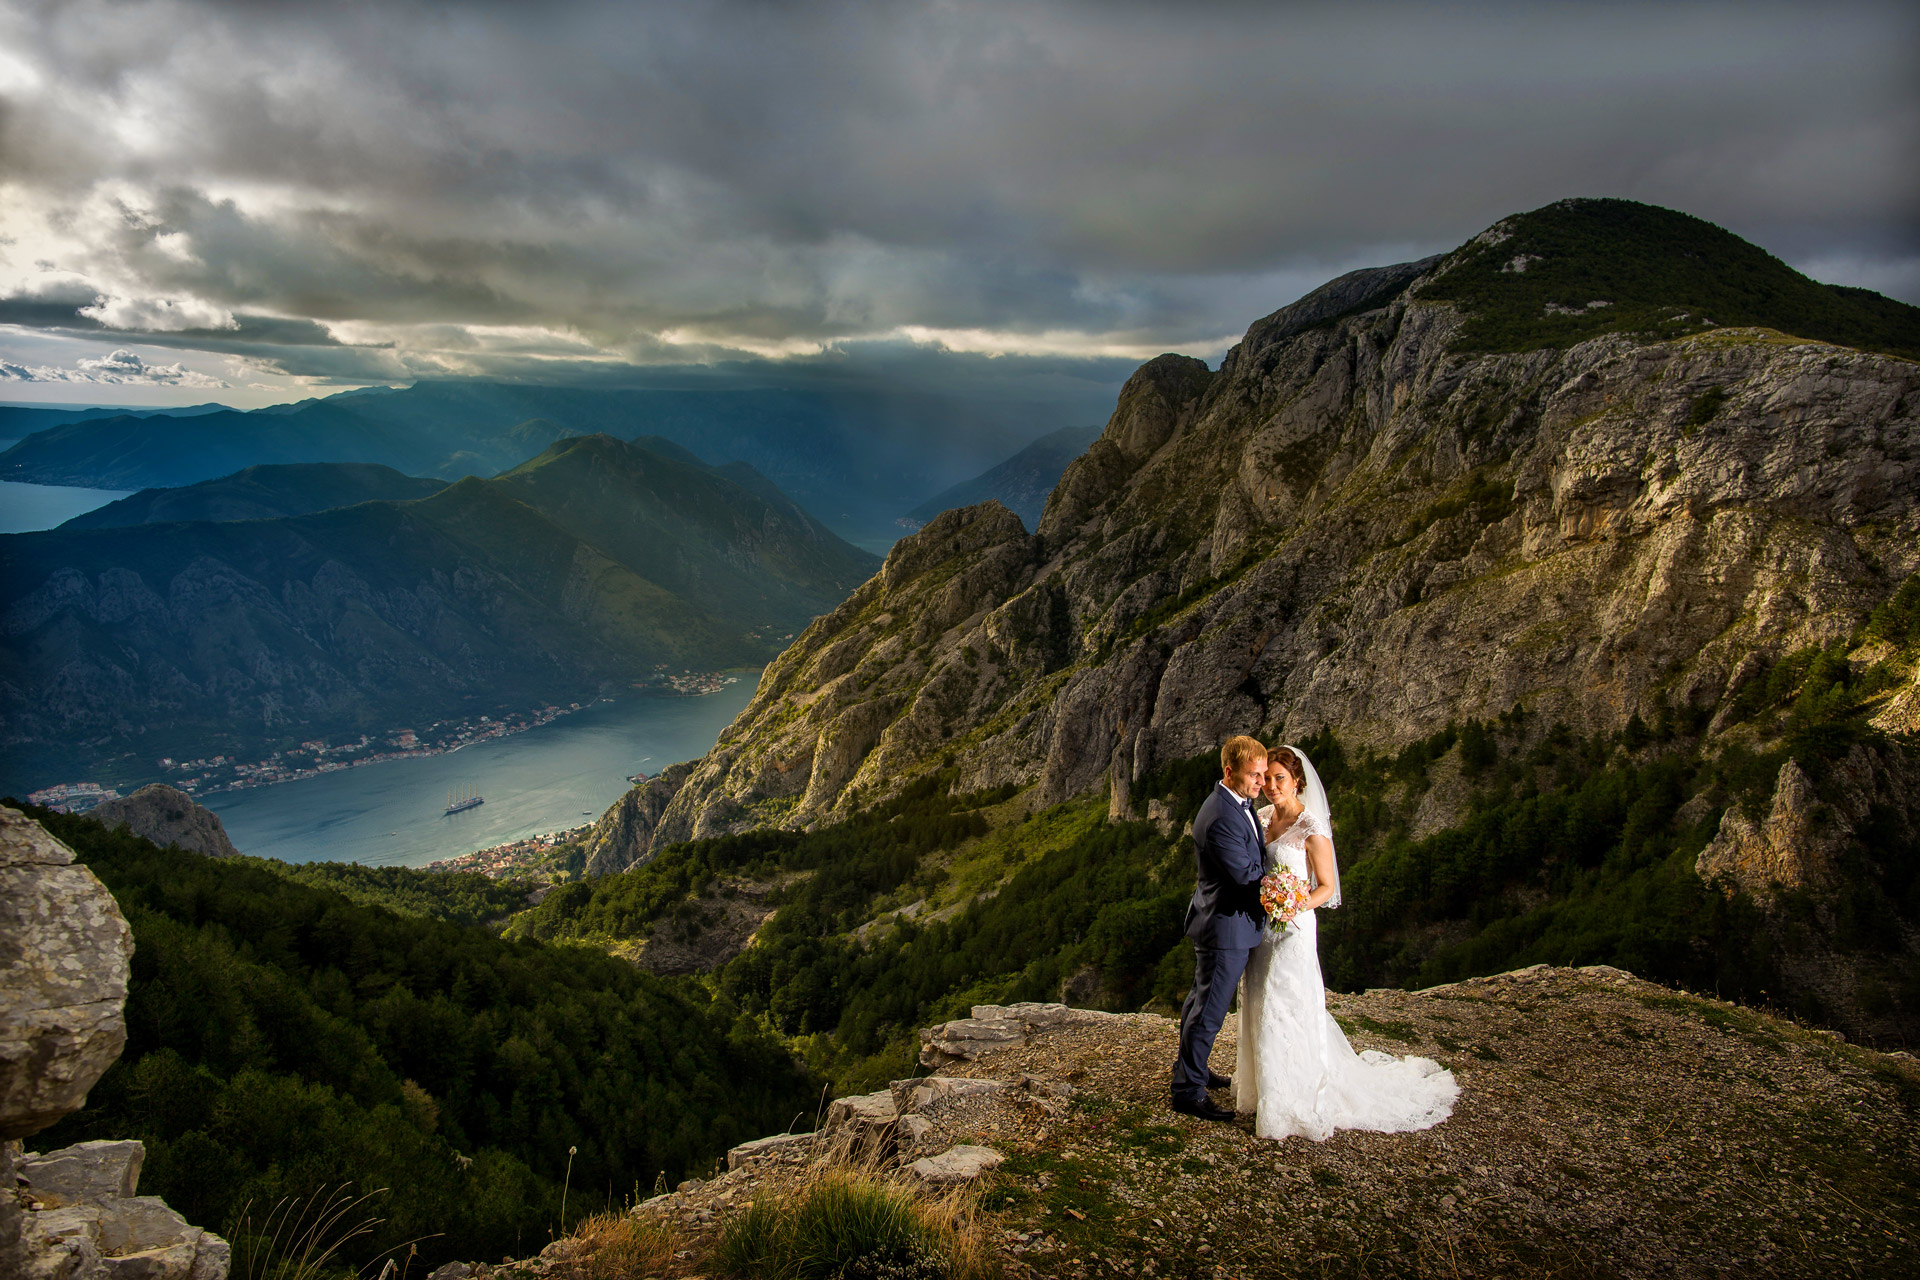 Romantična svadba iznad oblaka